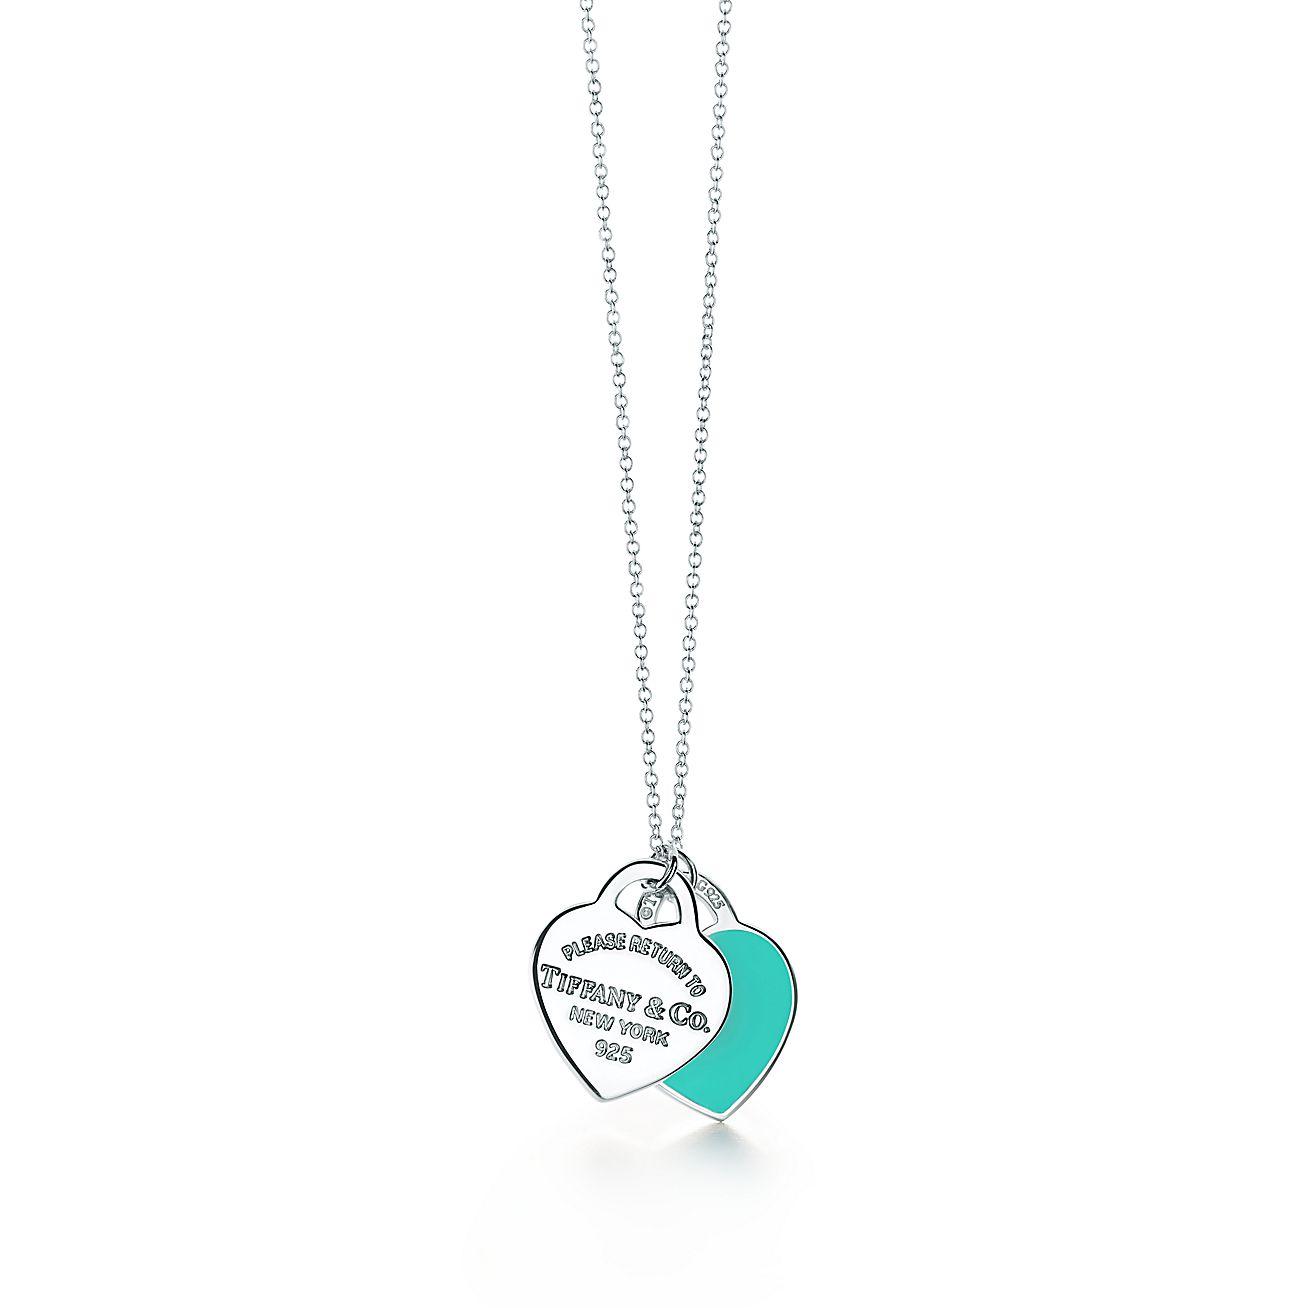 9f44e3f8afba7a Pendentif double Plaque Cœur Return to Tiffany™ en argent 925 millièmes.  Small.   Tiffany   Co.